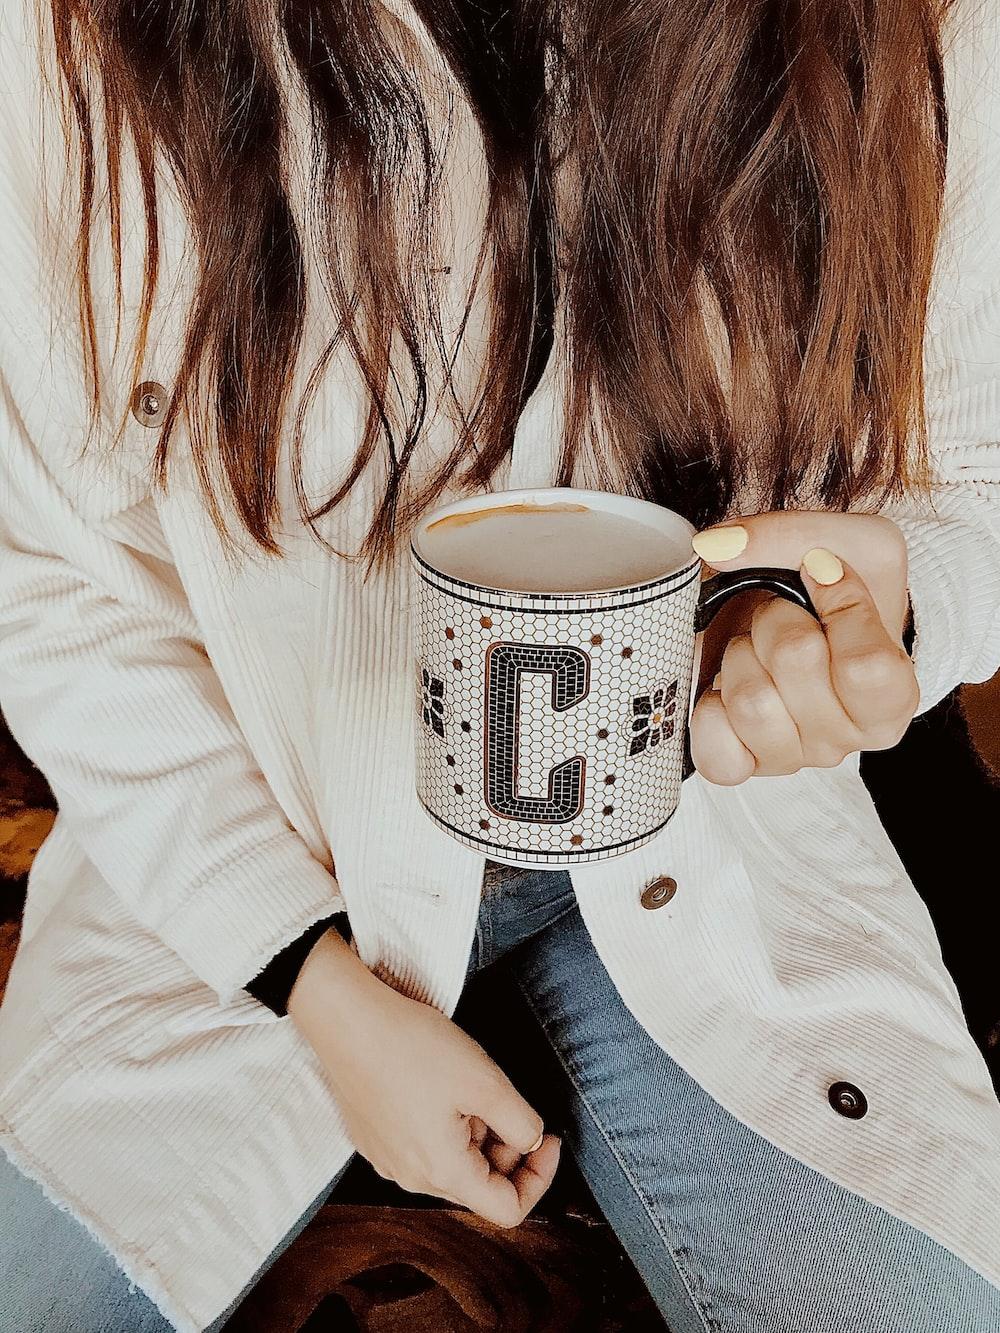 woman holding white and gray ceramic mug